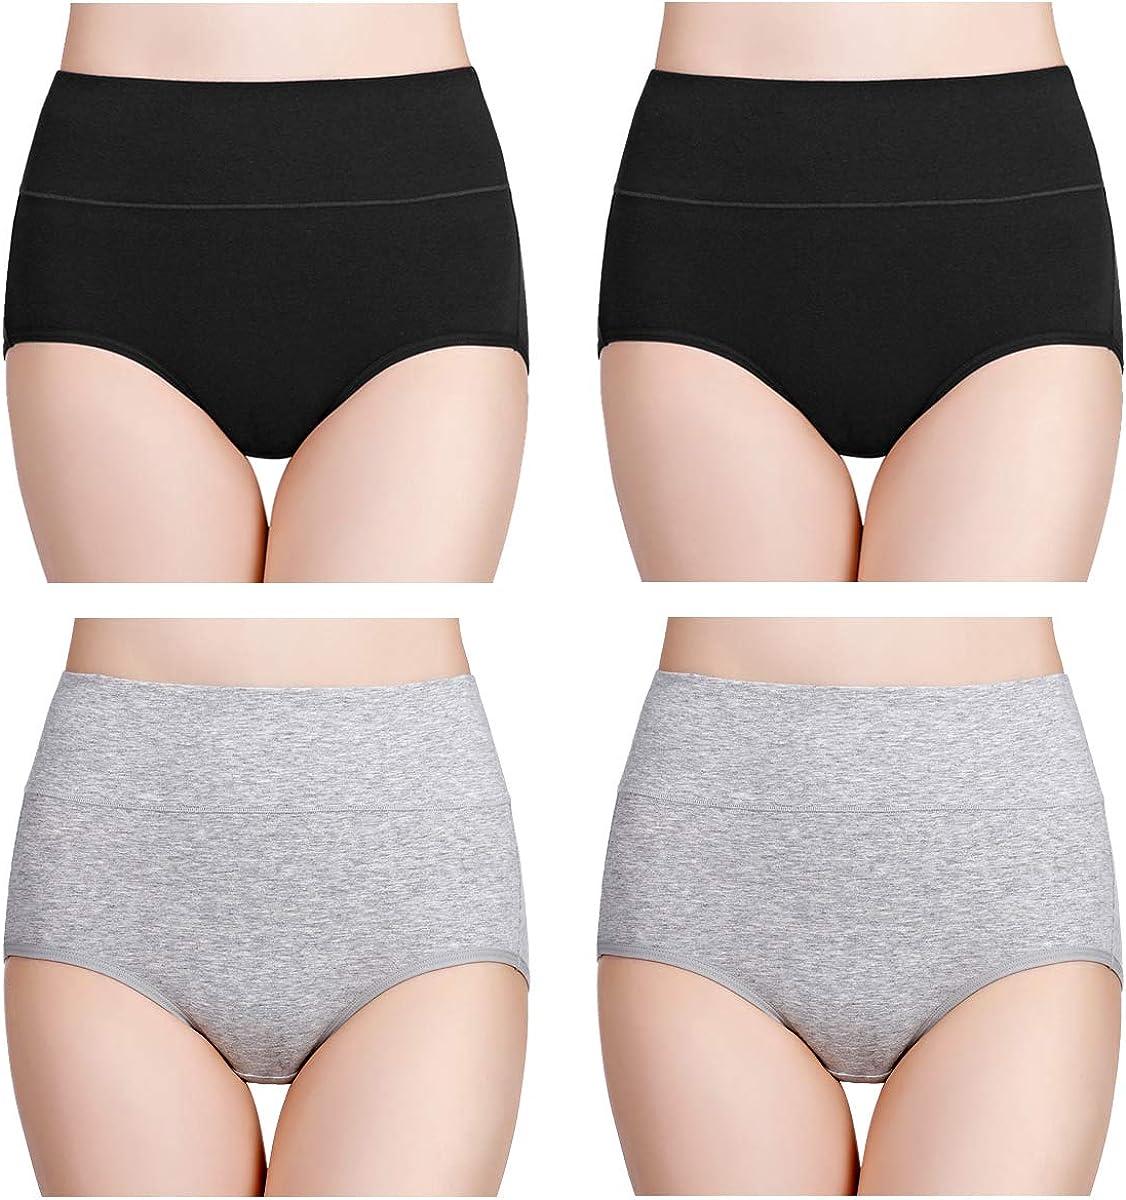 wirarpa Womens High Waisted Cotton Underwear Ladies Soft Full Briefs Panties Multipack